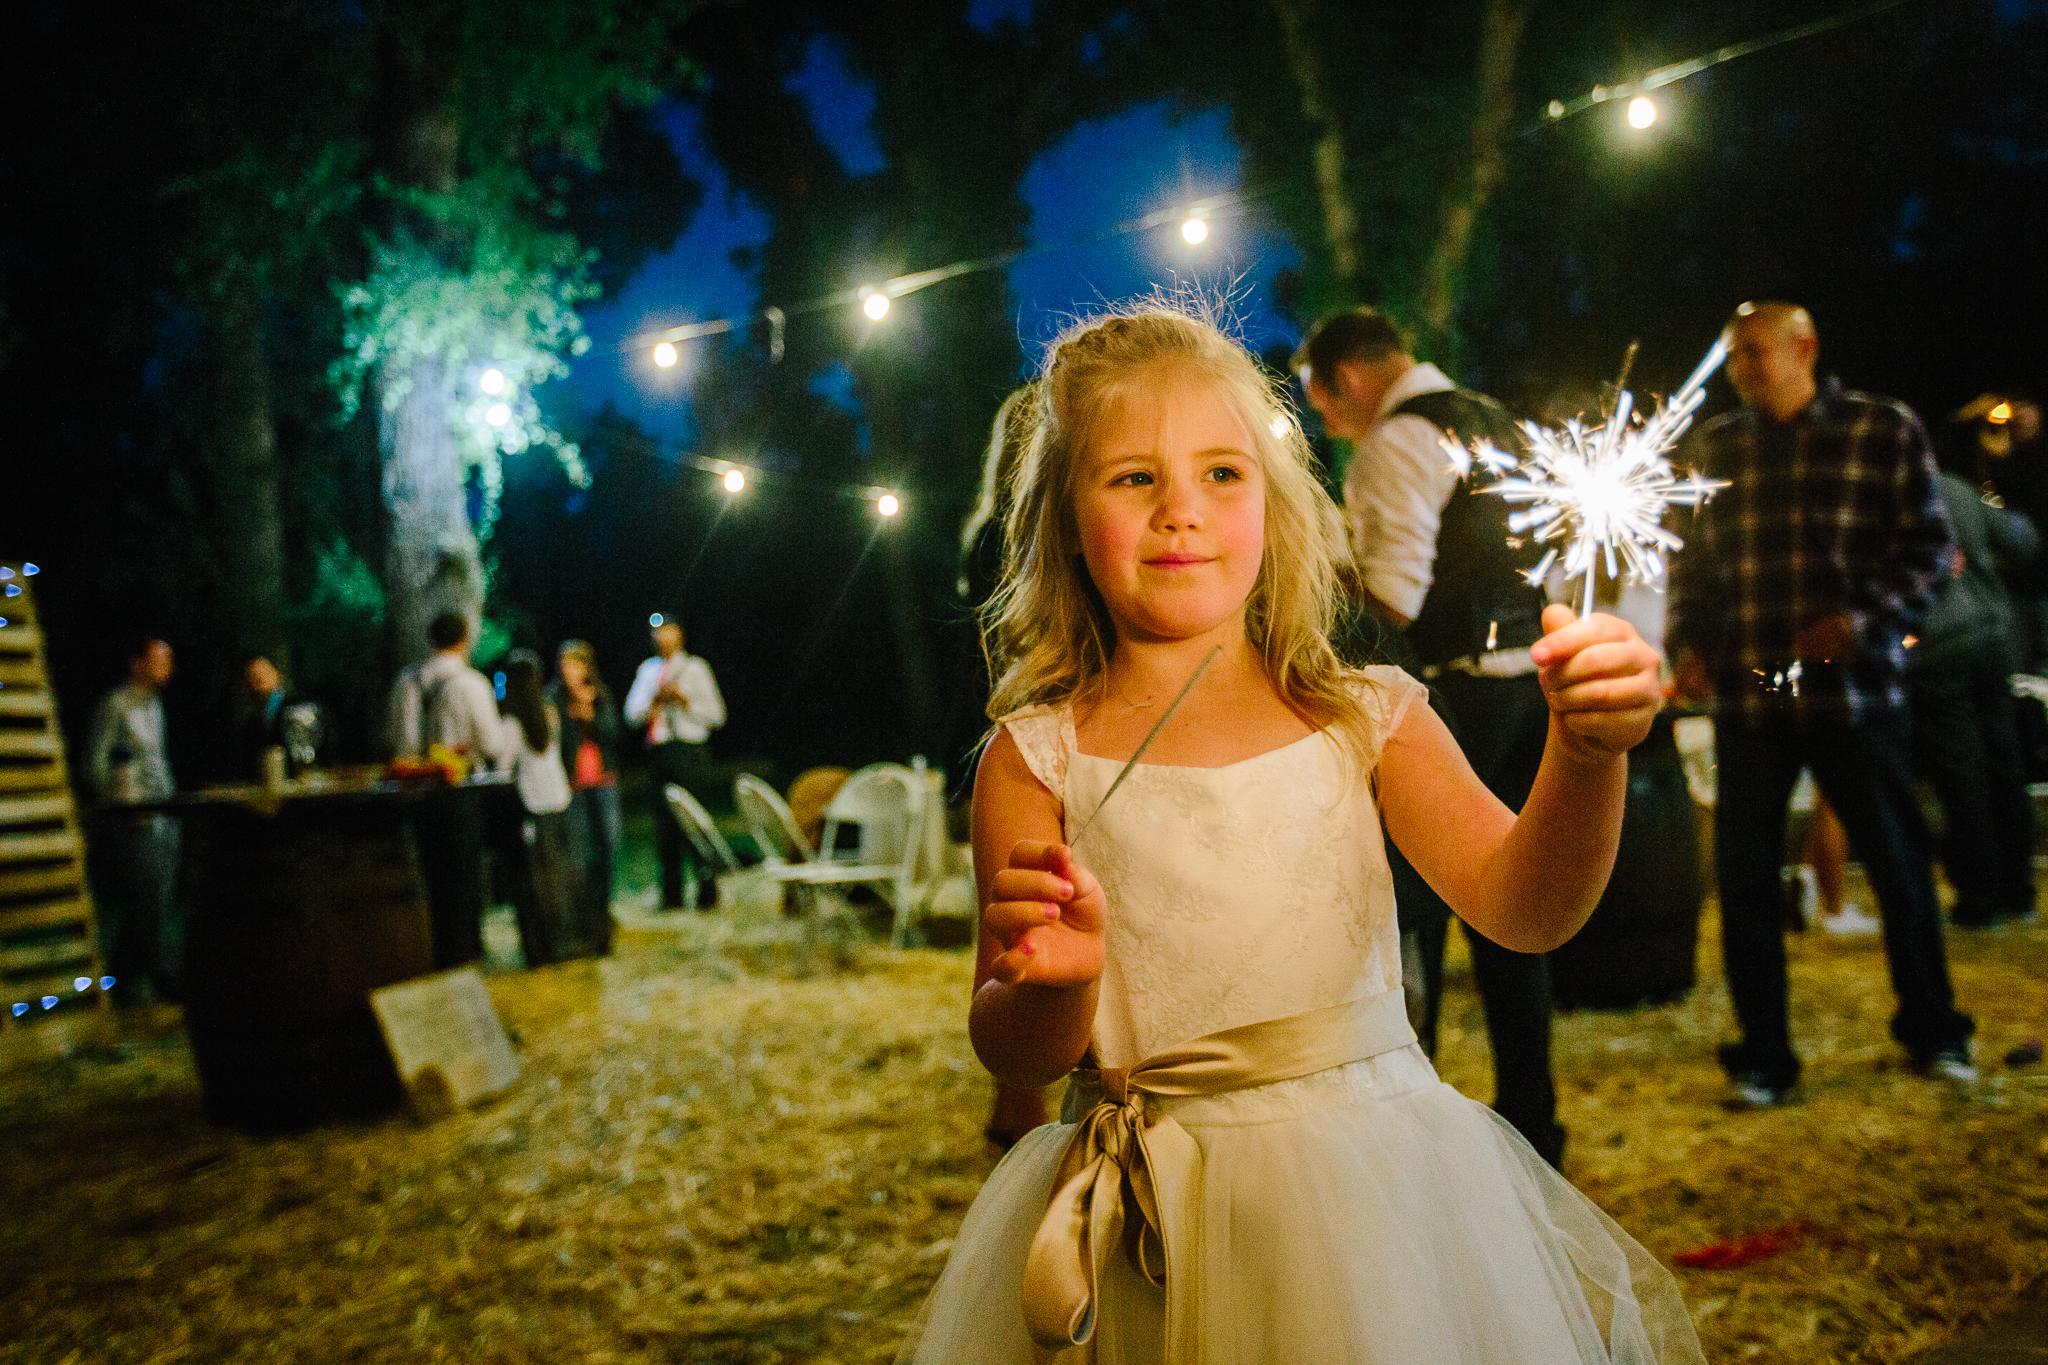 Prescott-Wedding-Photographer-3611.jpg